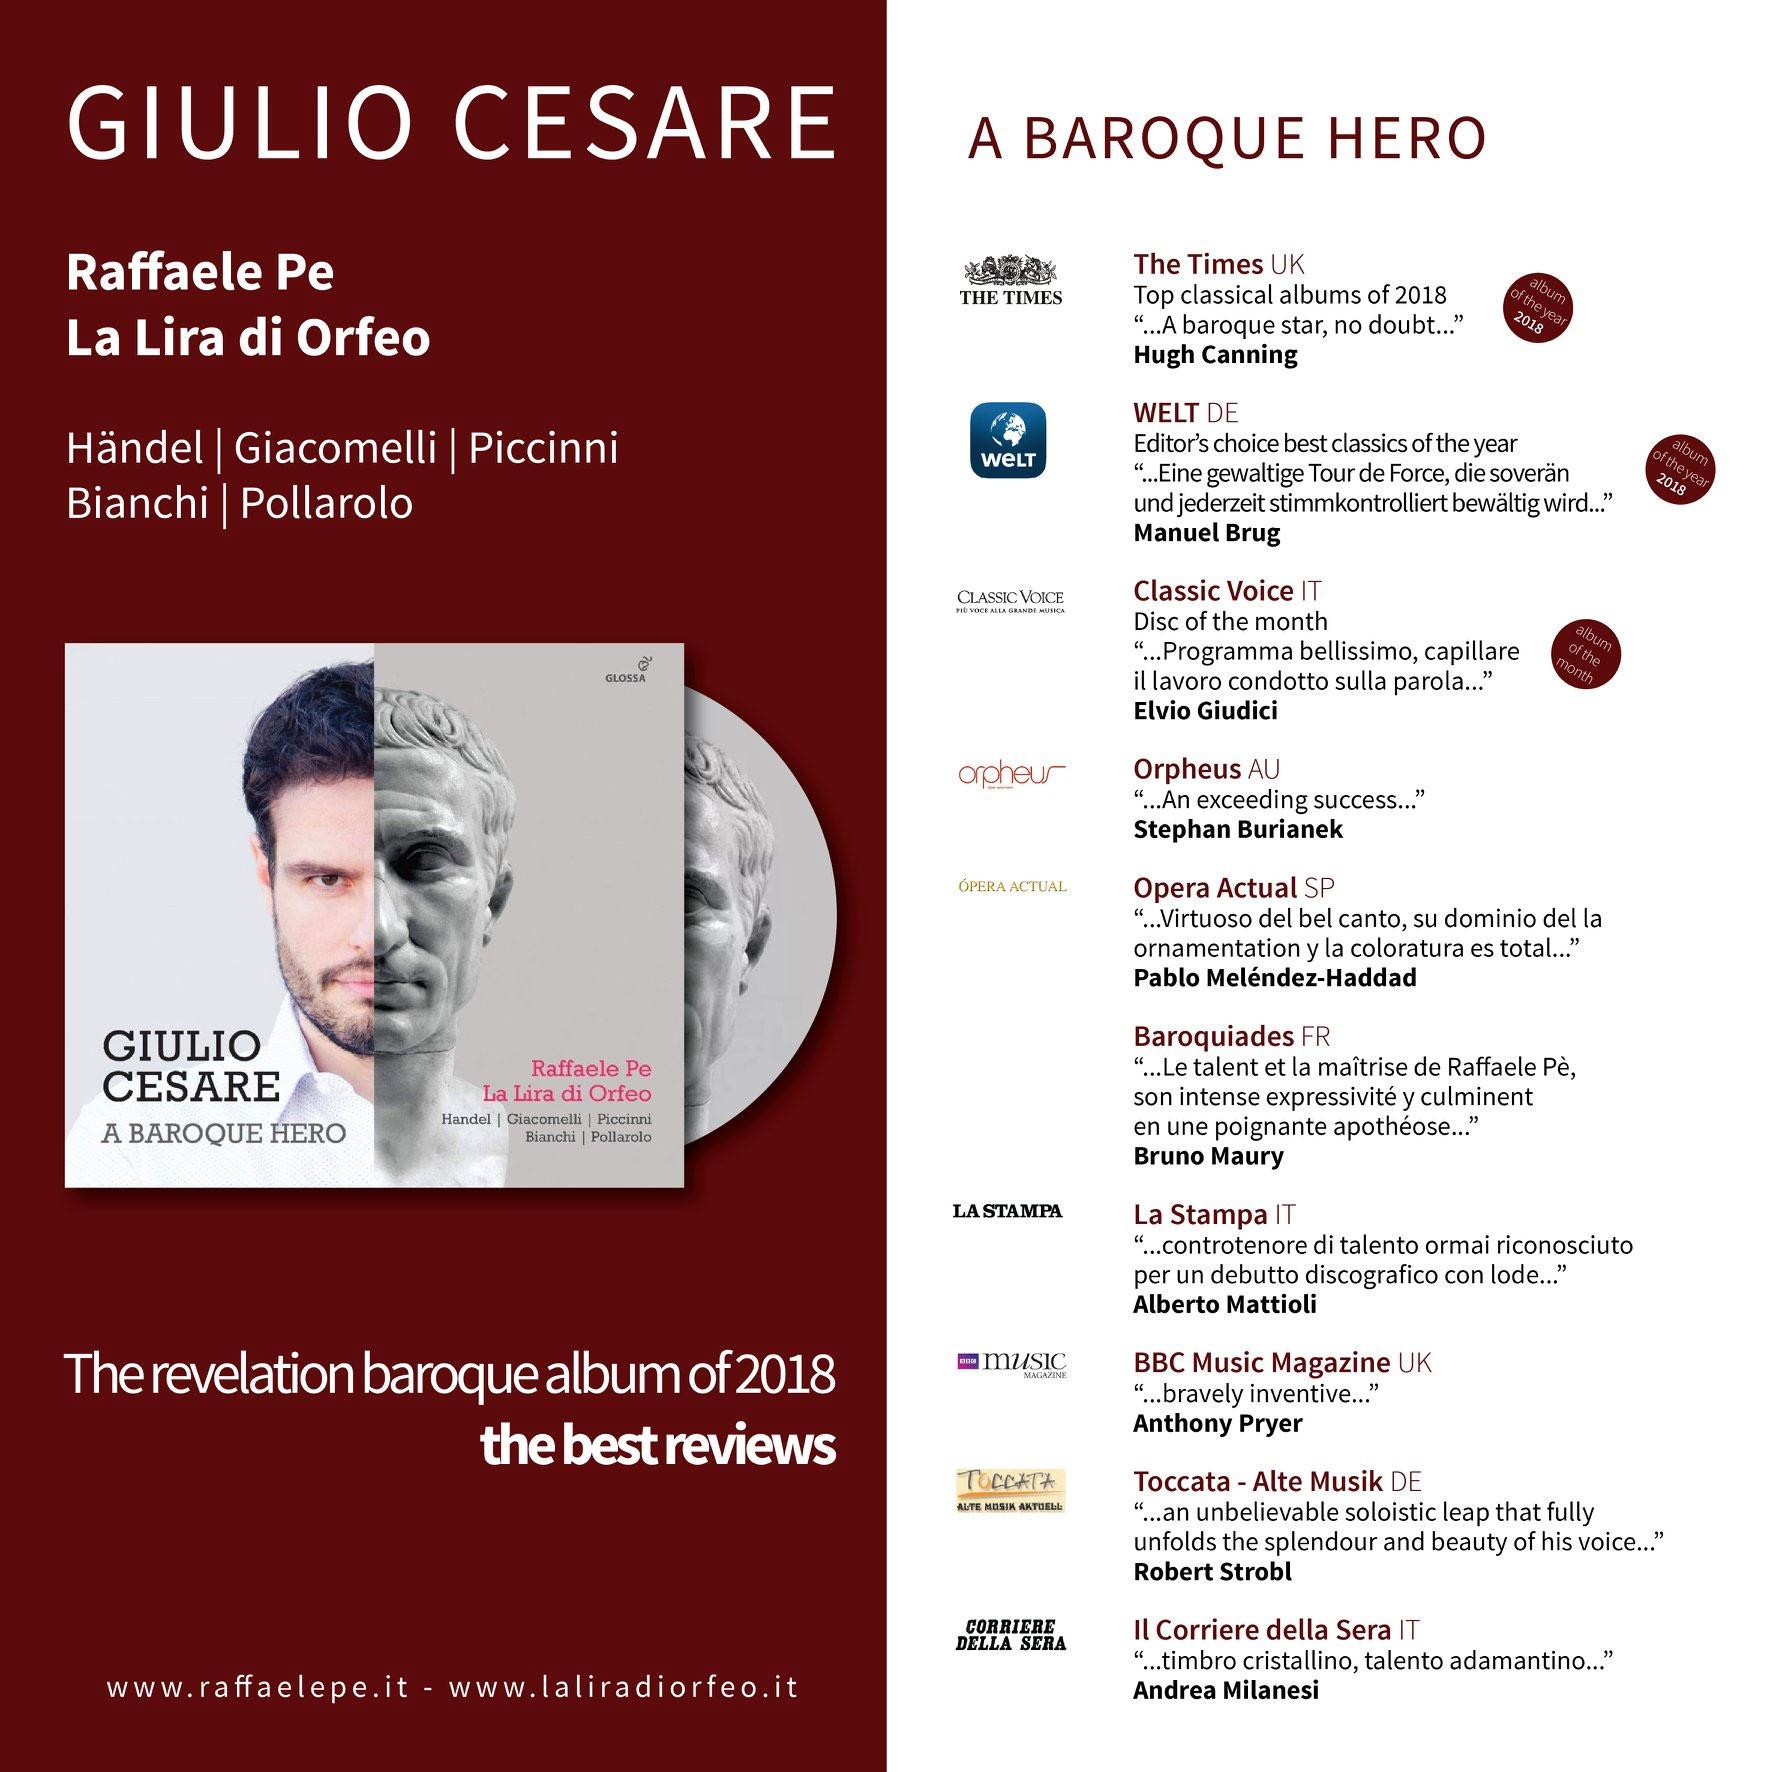 Raffaele Pe Giulio Cesare a Baroque Hero - tutte le recensioni